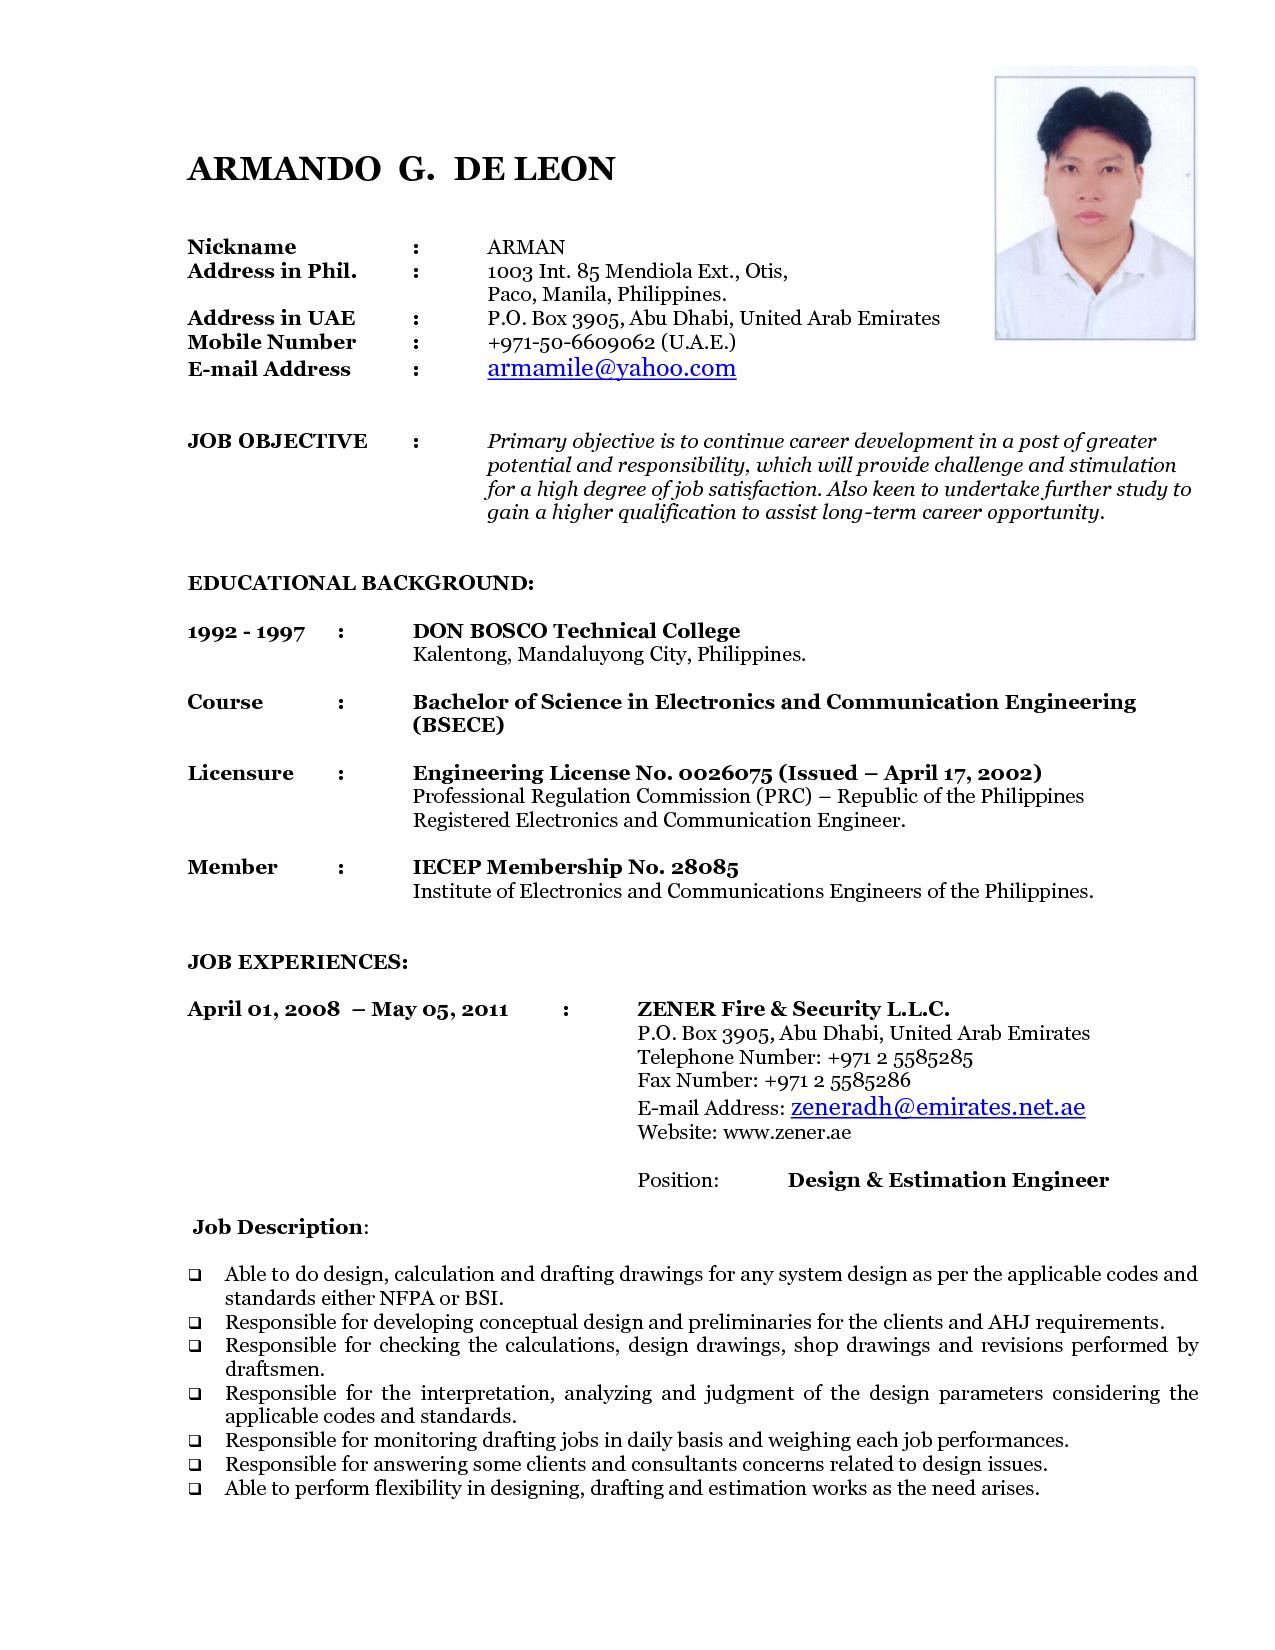 Resume Templates Latest Resume Templates Latest Resume Format Best Resume Format Resume Format